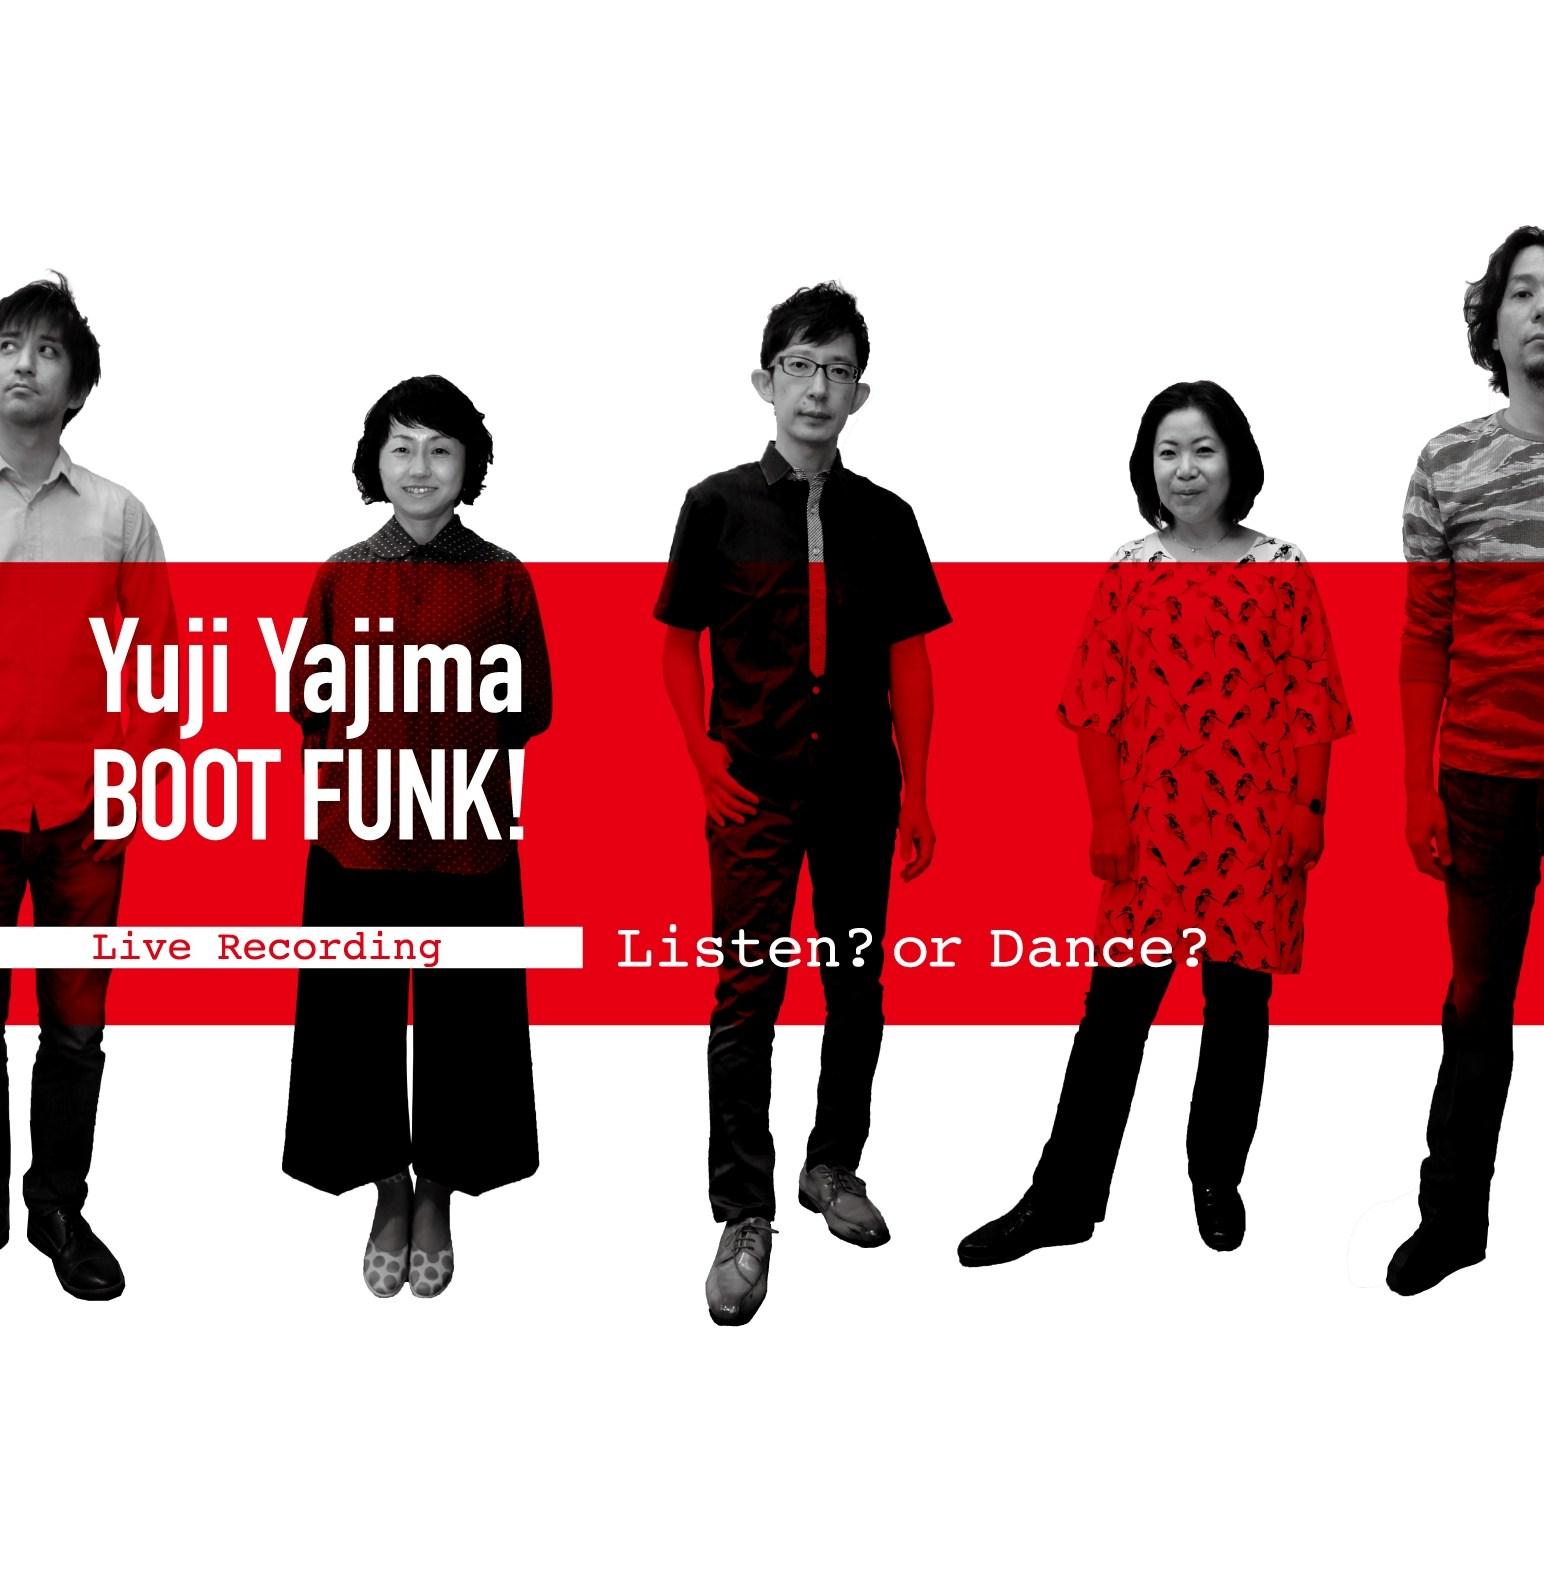 Listen_or_Dance_jacket-2.jpg